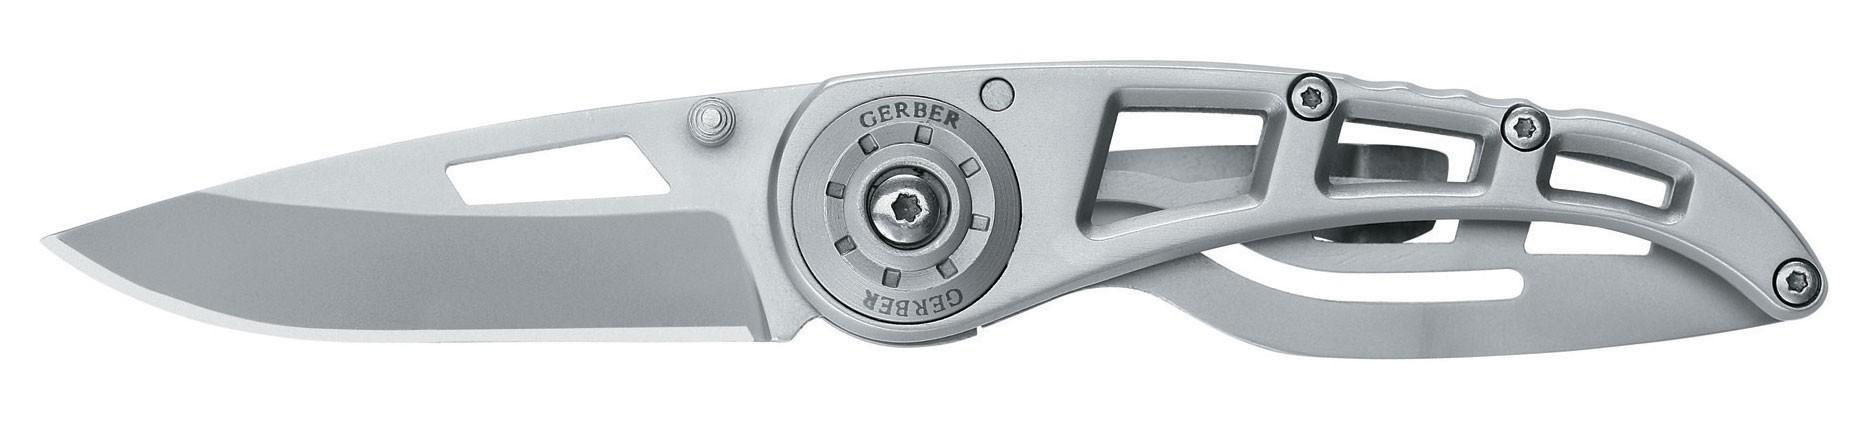 Gerber Ripstop II Serrated Folding Blade